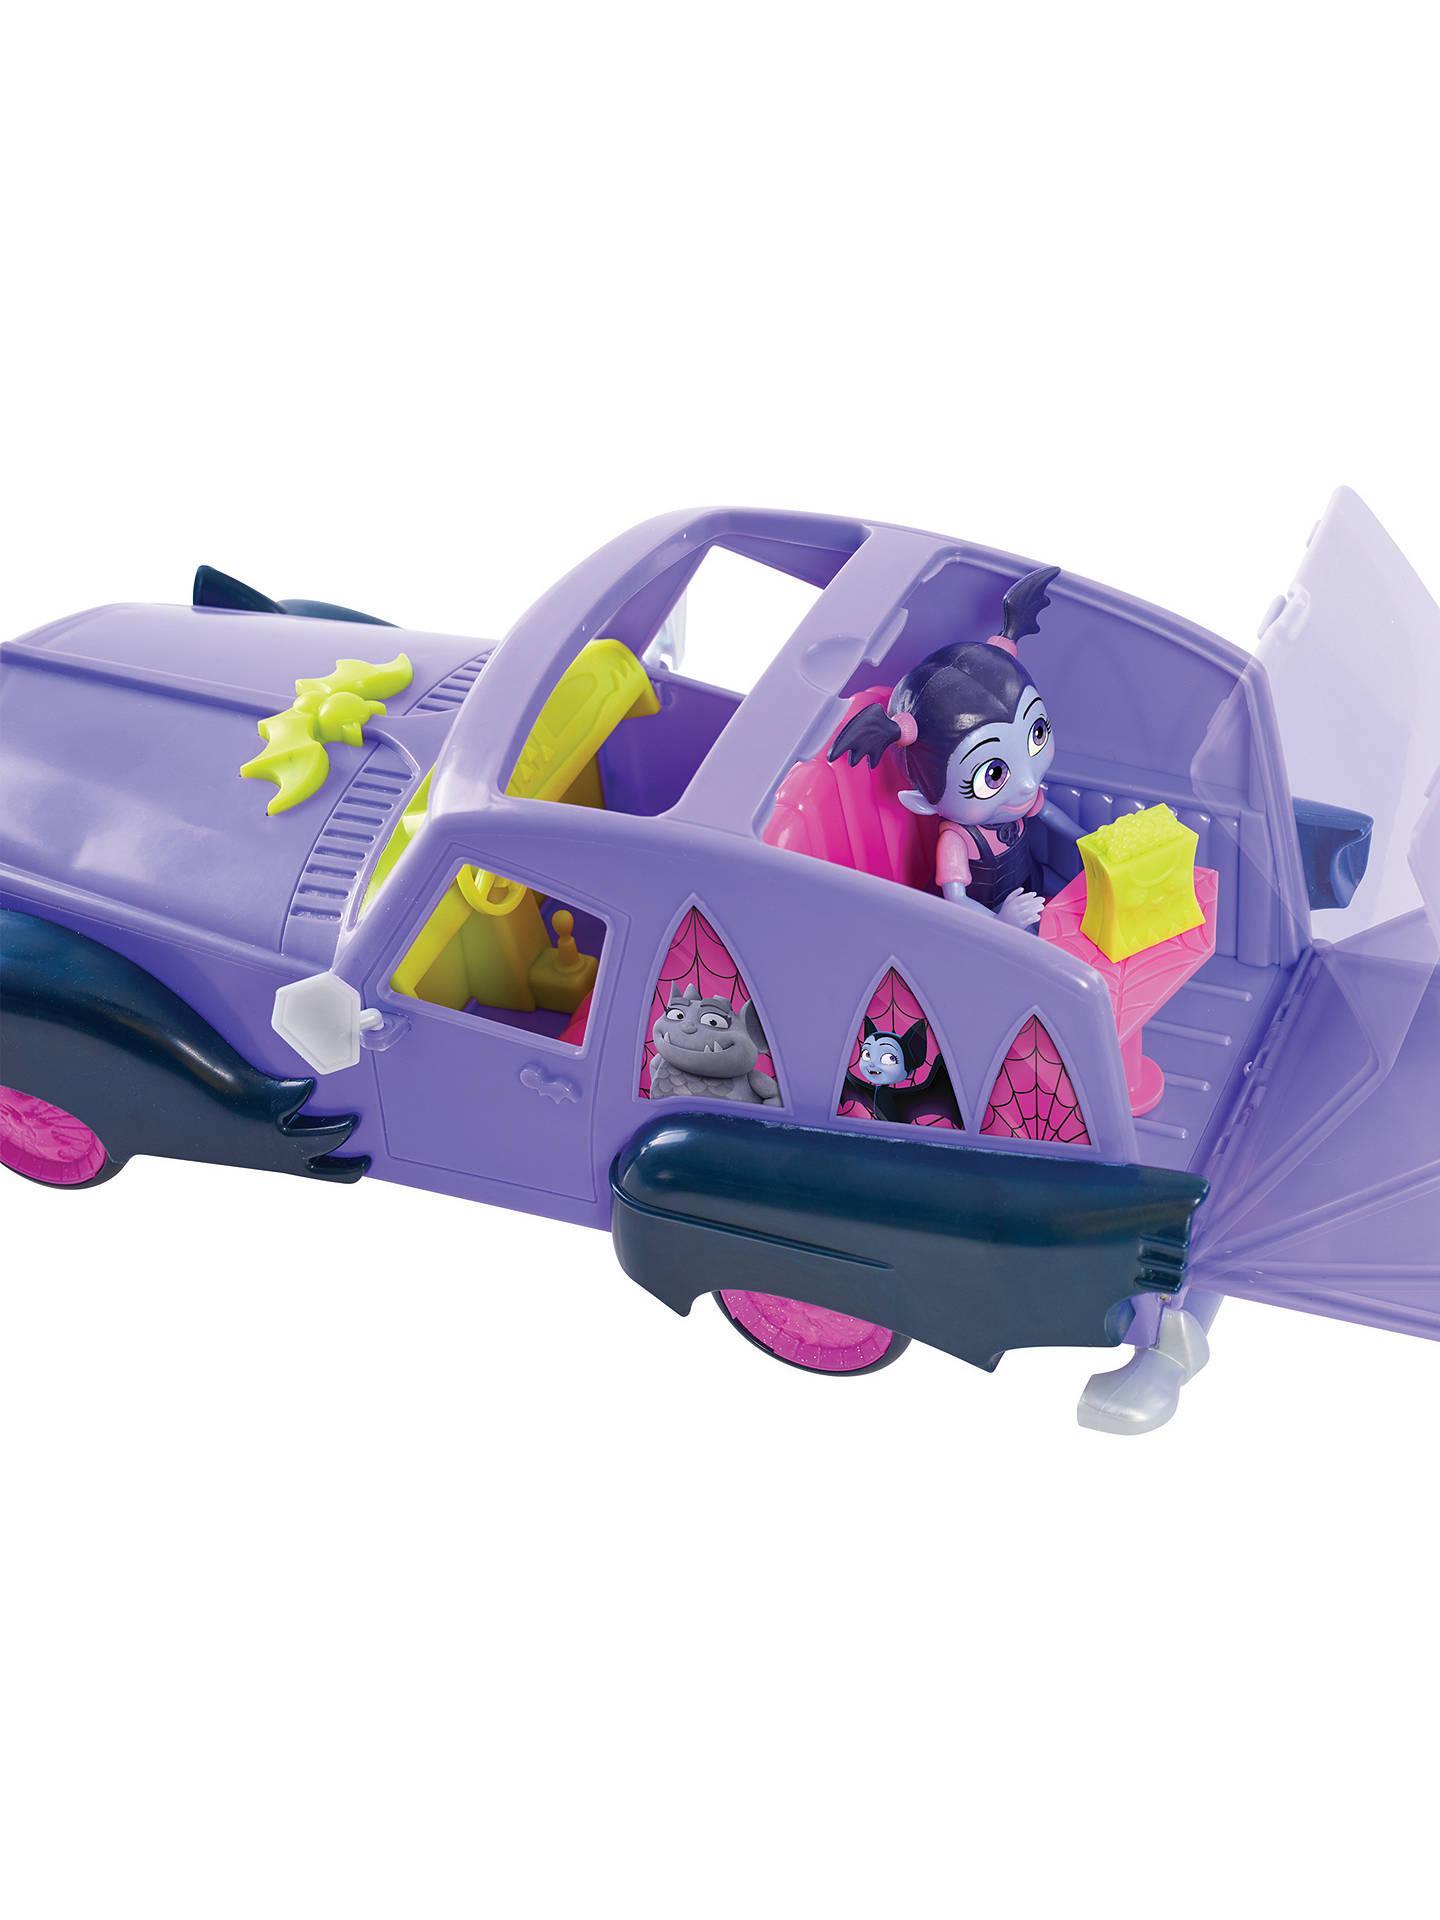 Disney Junior Vampirina Hauntley mobile NEUF